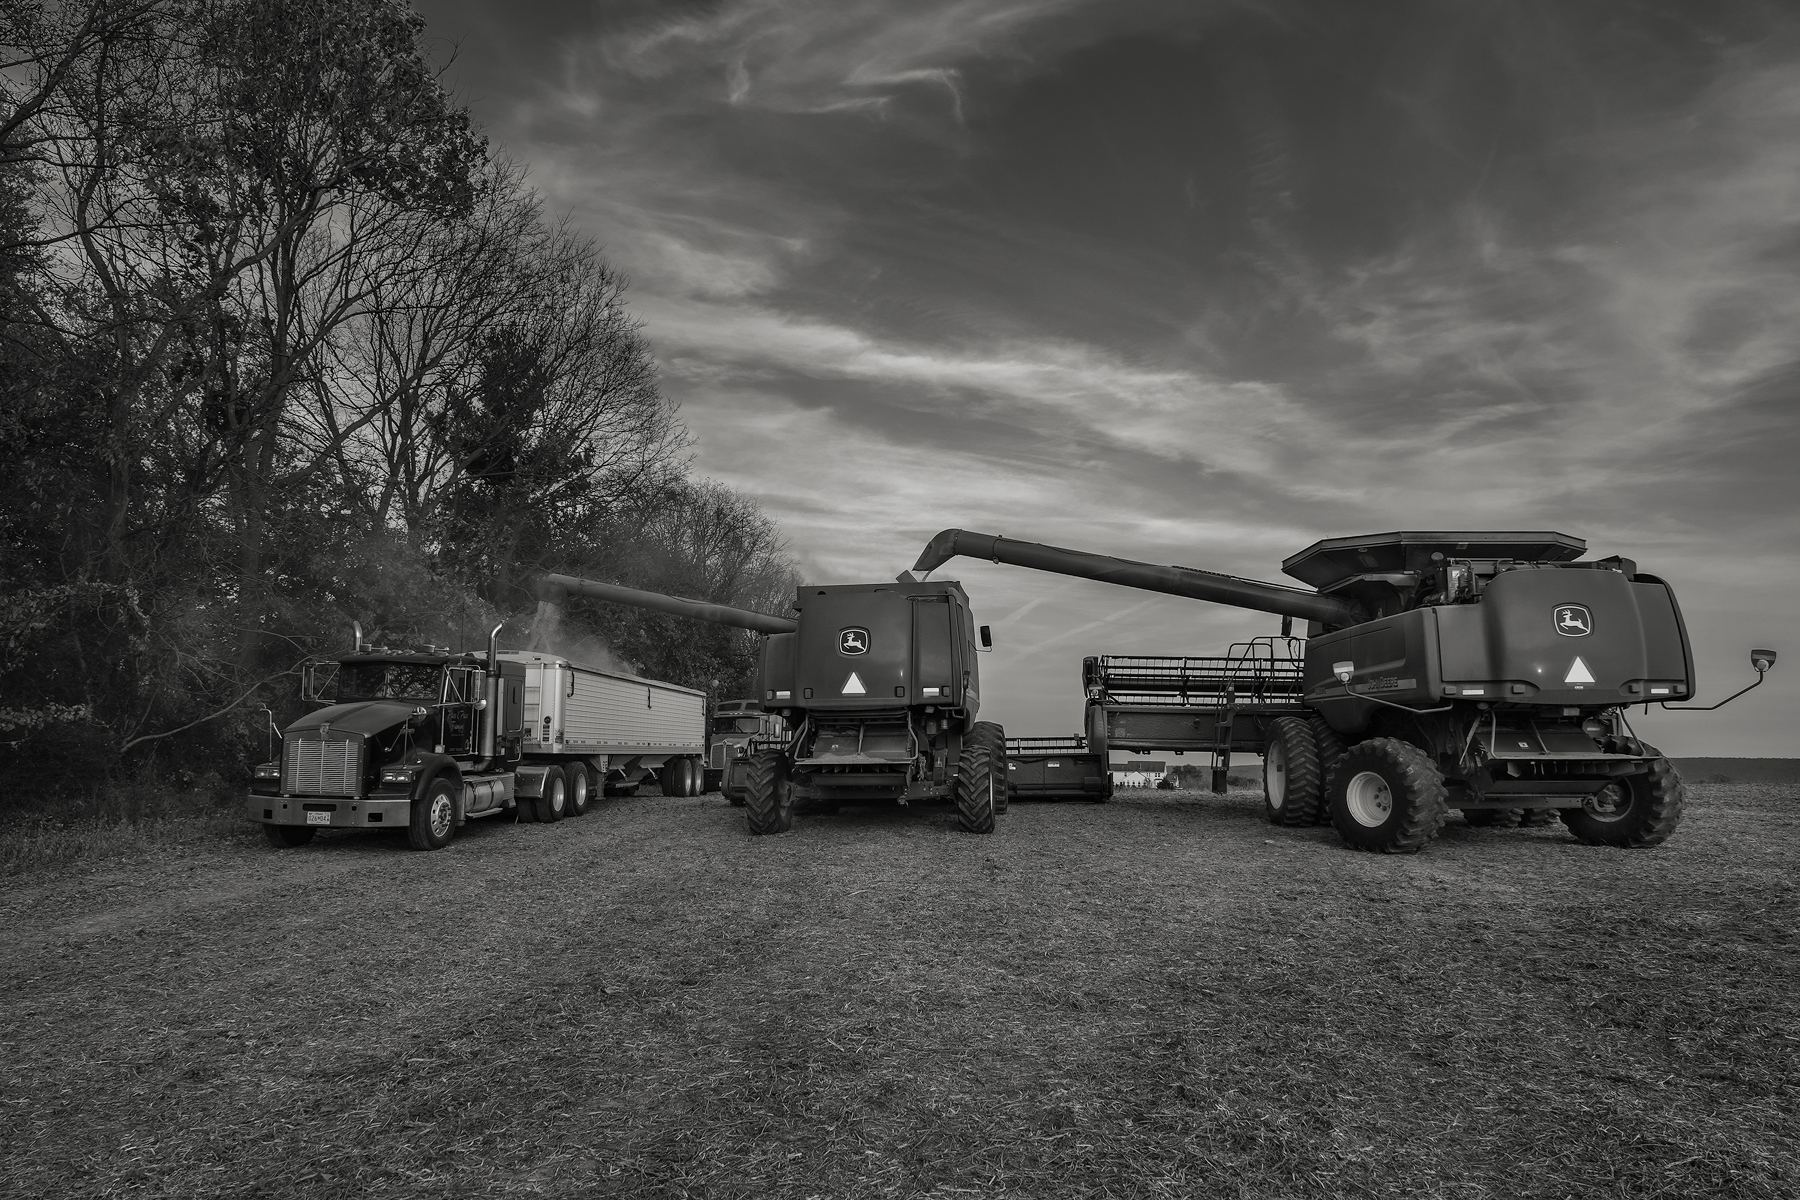 Unloading the harvest. Fuji X-T2 and a Fujinon XF16-55mm f2.8 WR at 23mm. Image exposed at ISO 800 at f5.6 for 1/125 of a second.